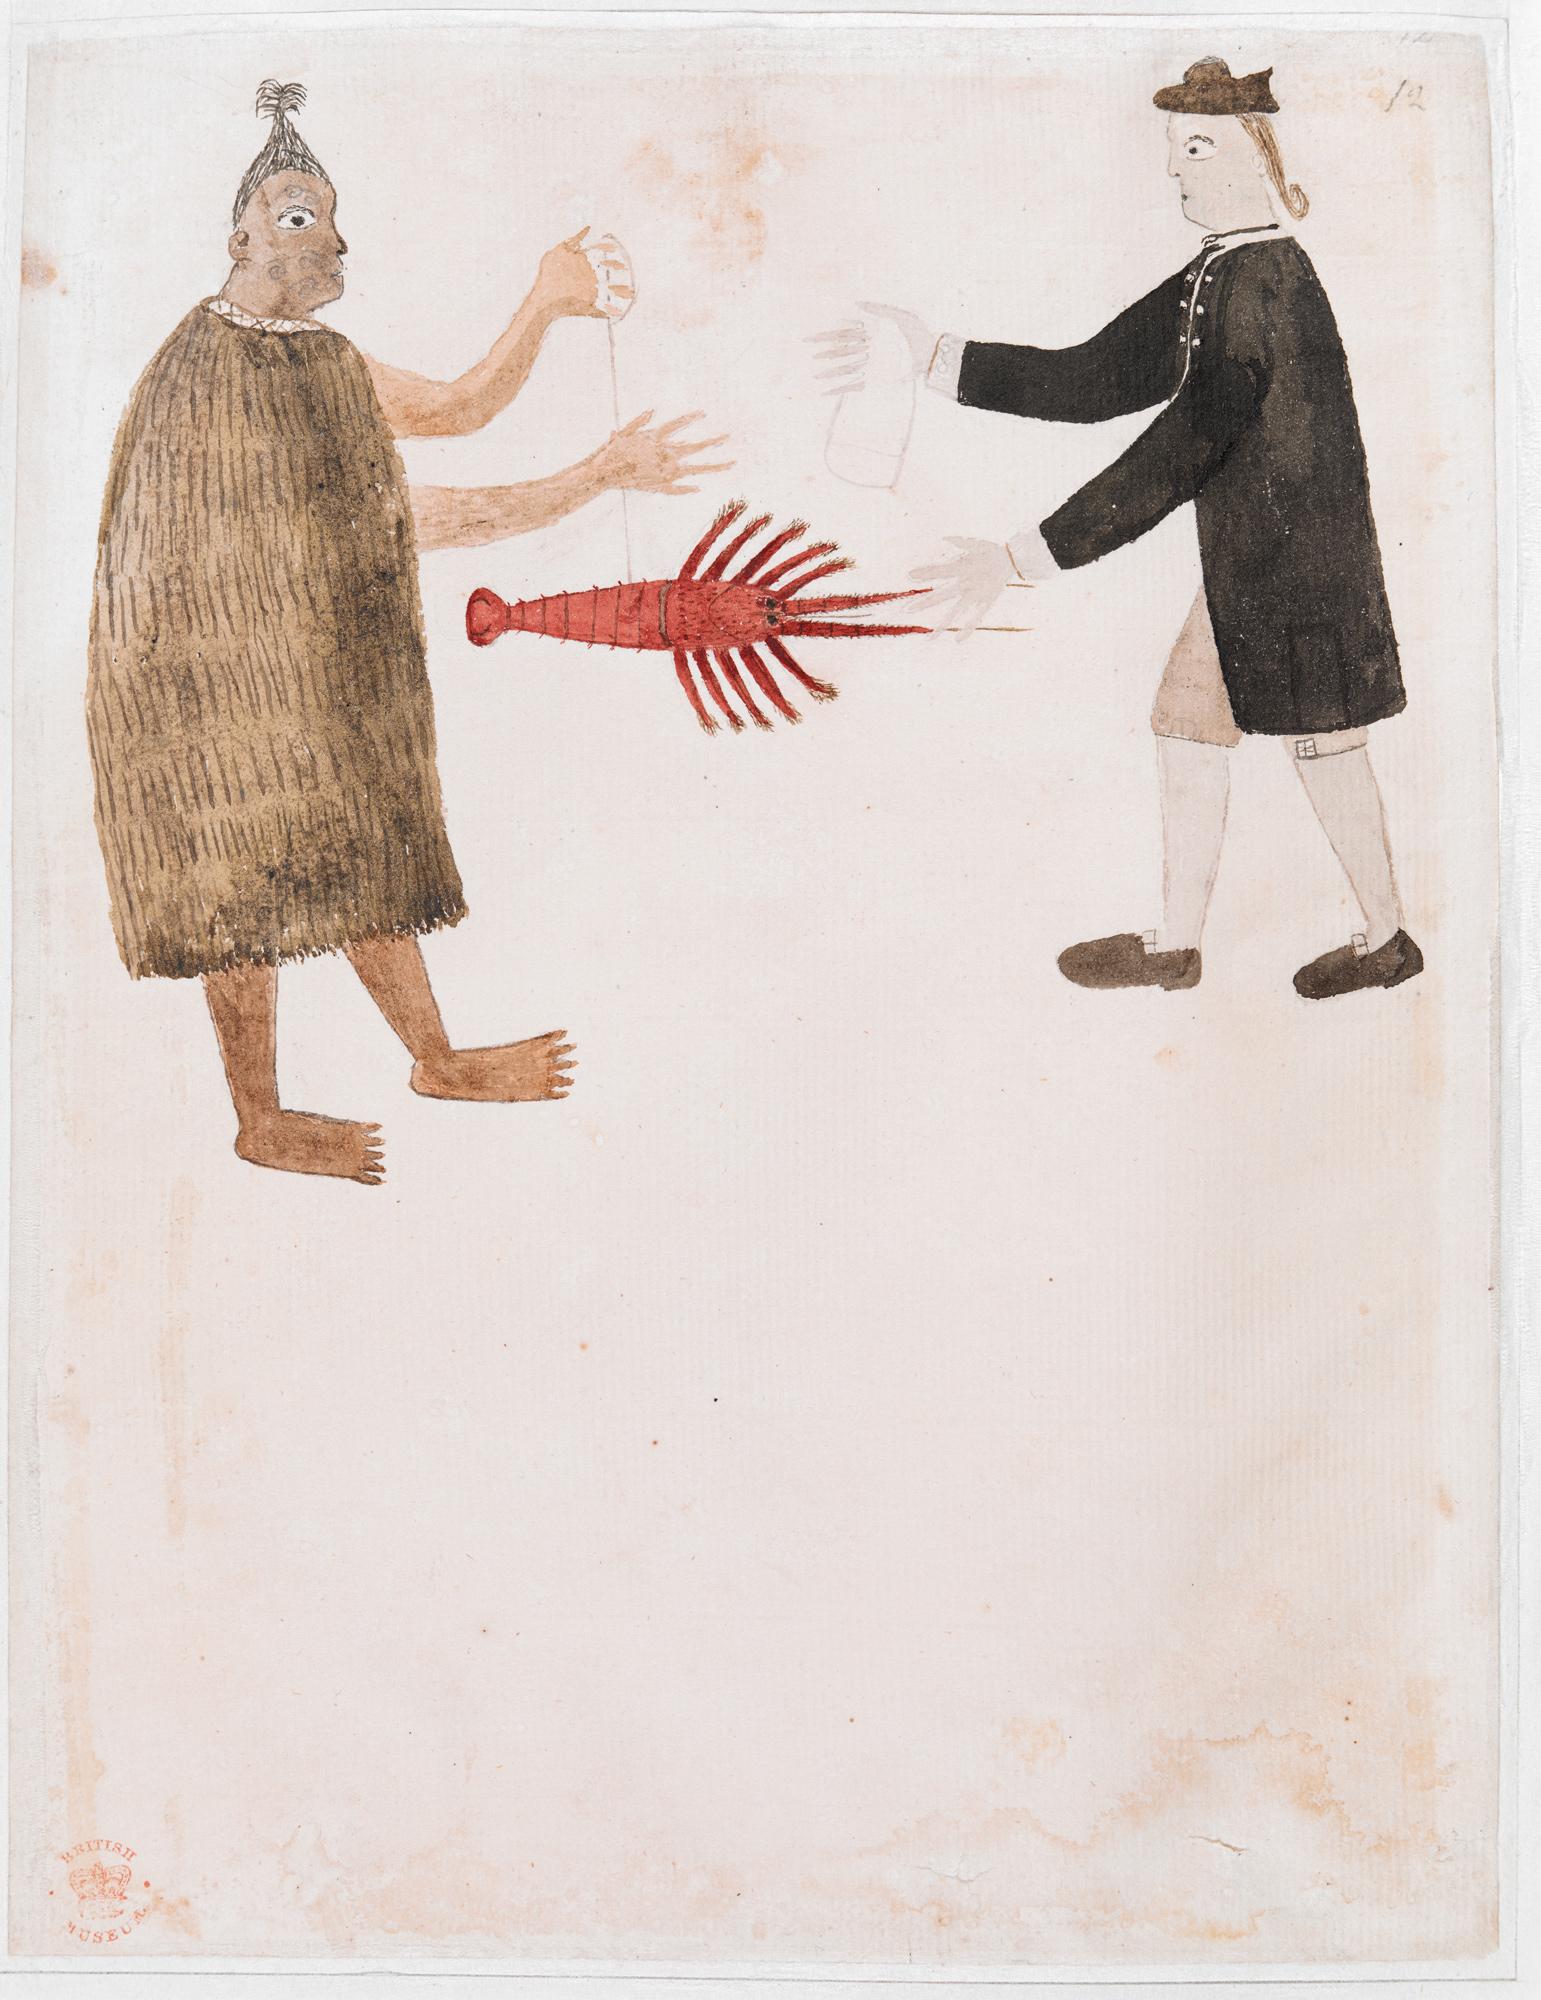 Maori trading a crayfish with Joseph Banks add_ms_15508 - 12